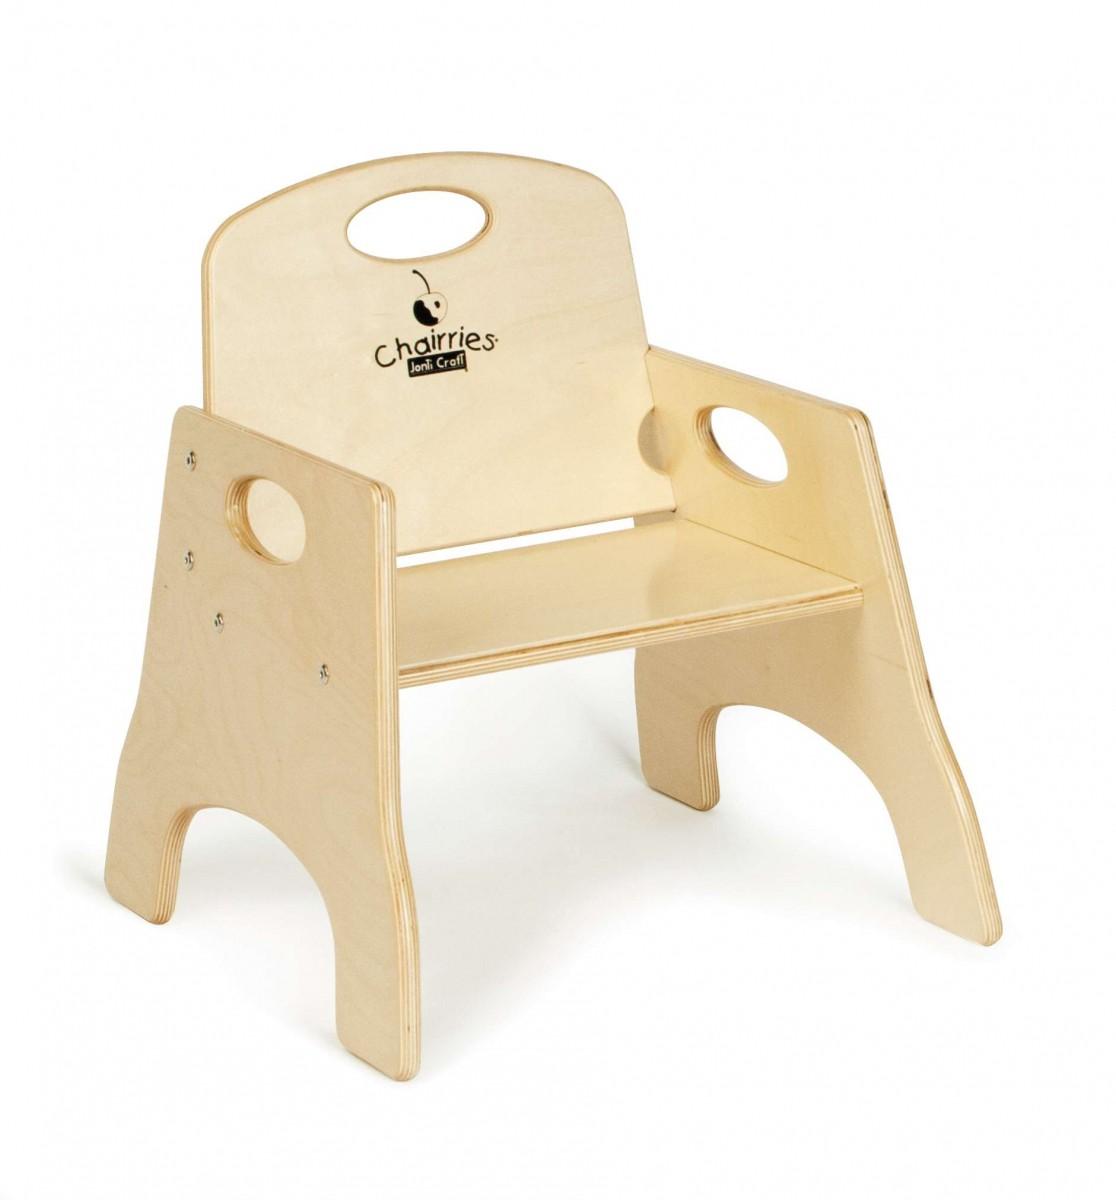 Jonti Craft Chairries